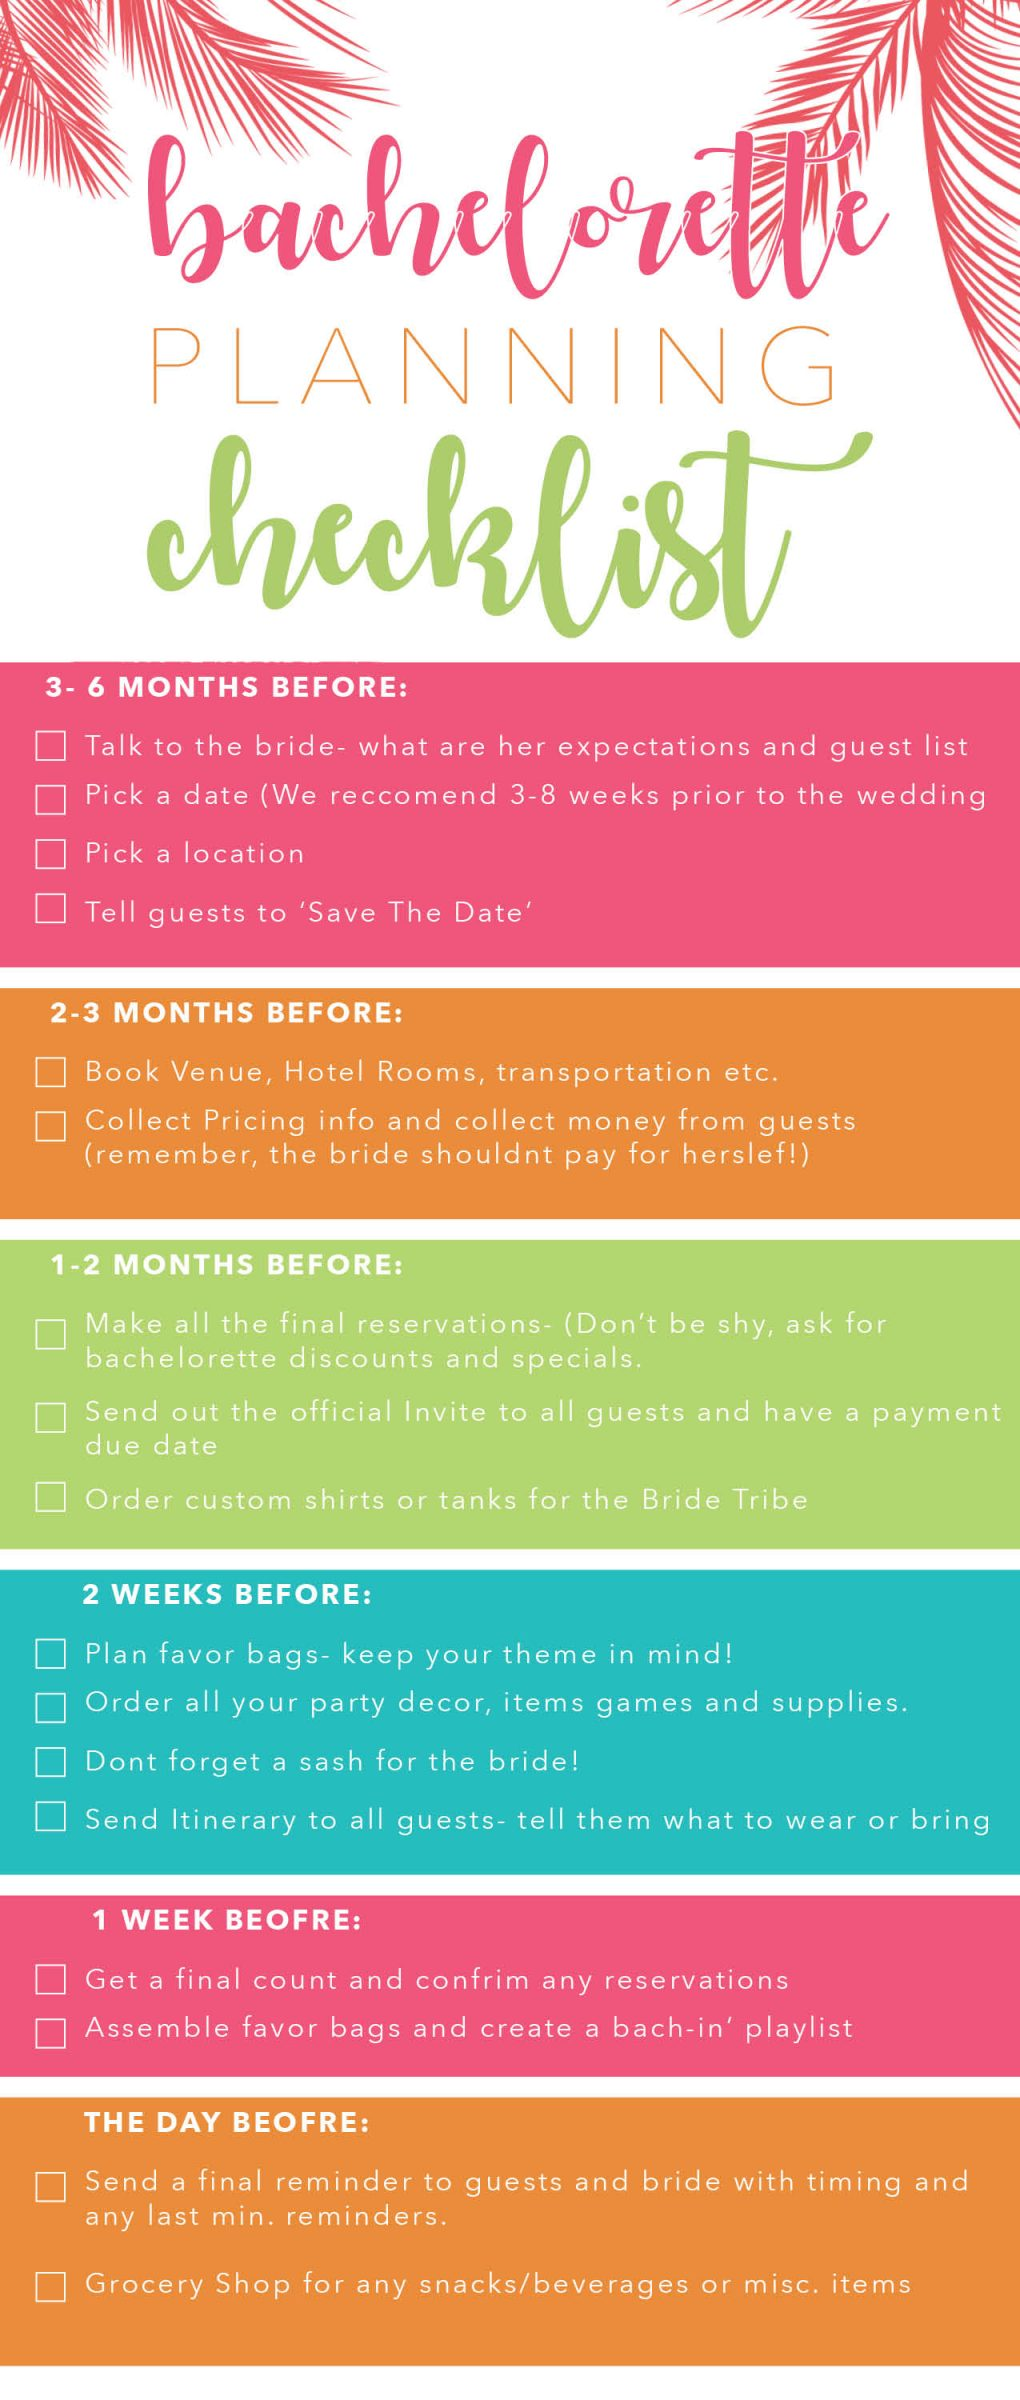 Bach-Checklist.jpg